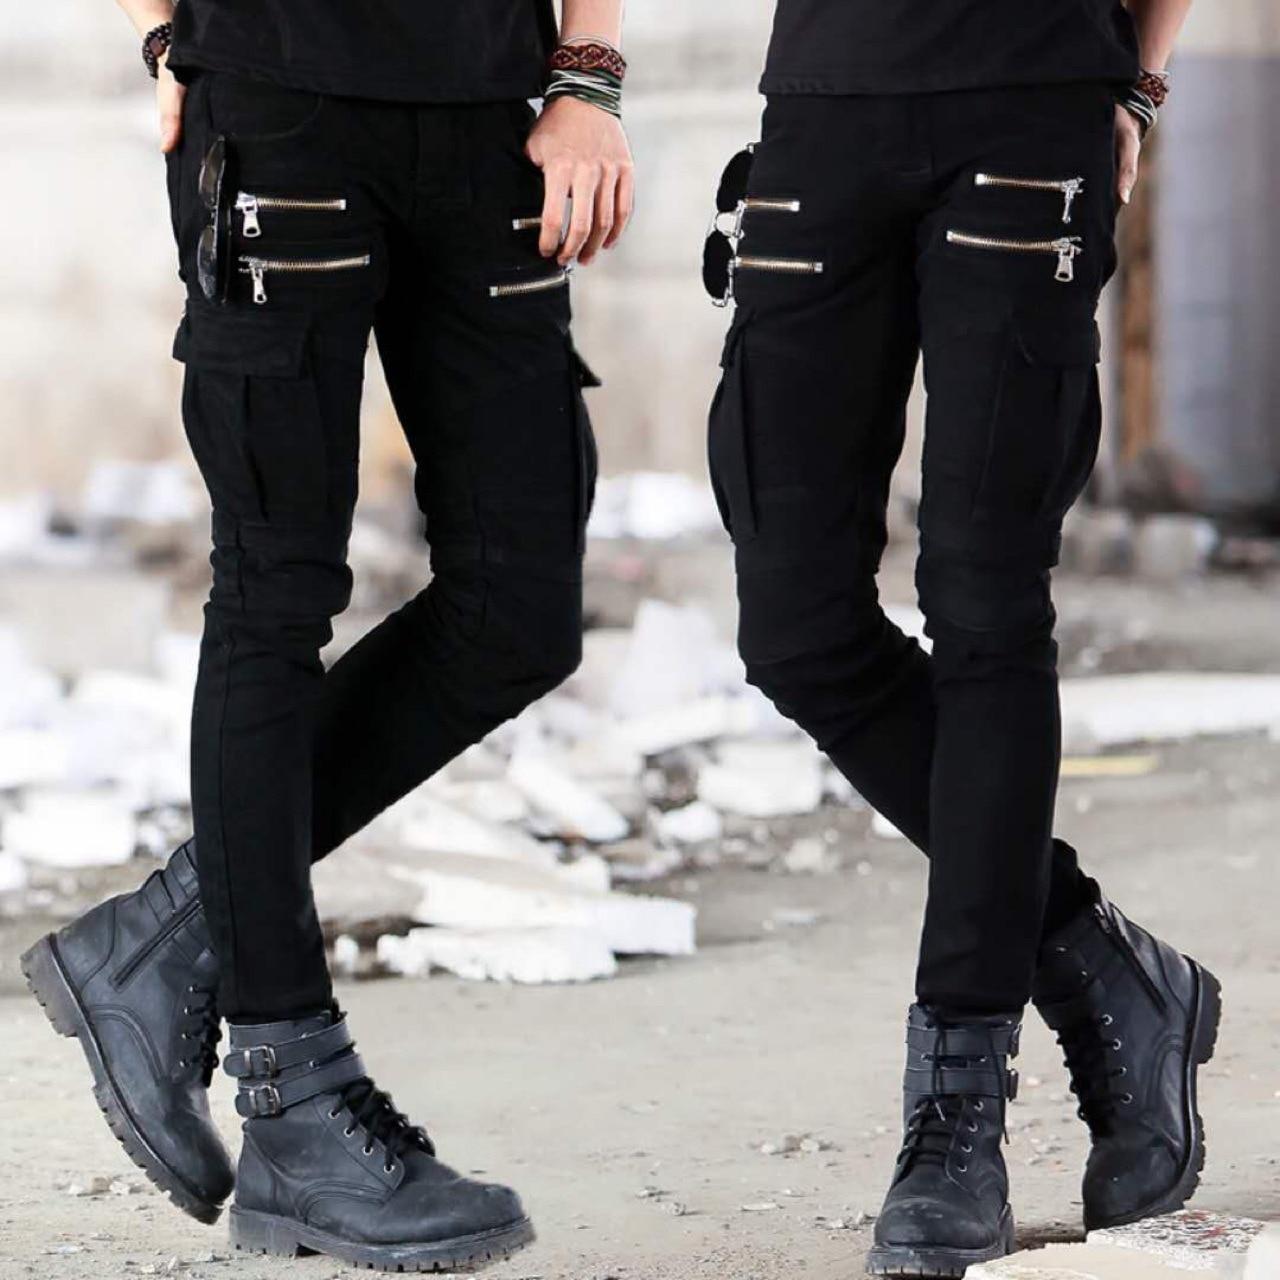 New Dropshipping Brand Hot Sale Denim Jeans Moto Biker Fashion Pants Black Jeans Hipster Stretch Leg Pleated Biker Pant